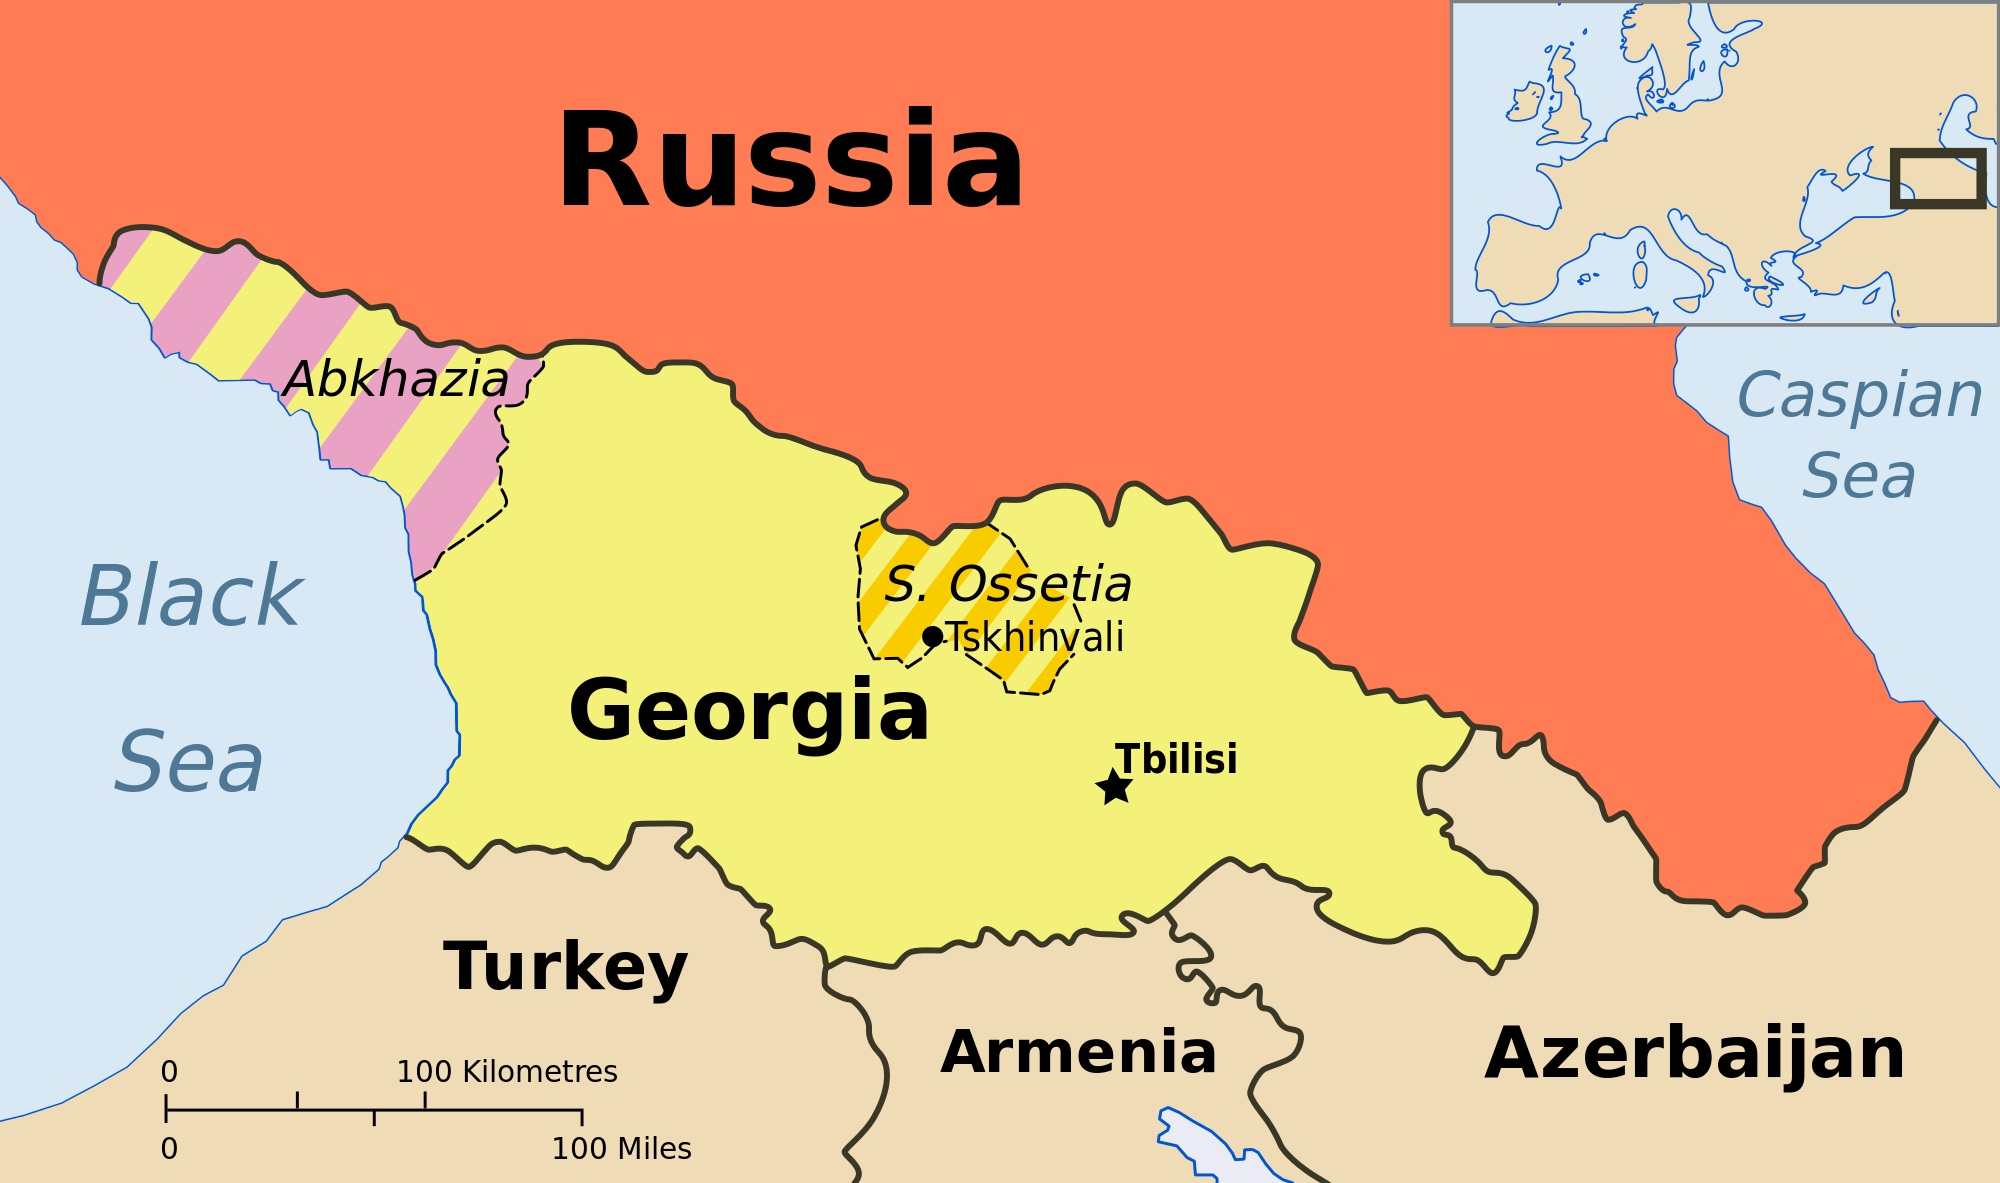 Russian treaty with rebel Georgian region alarms West